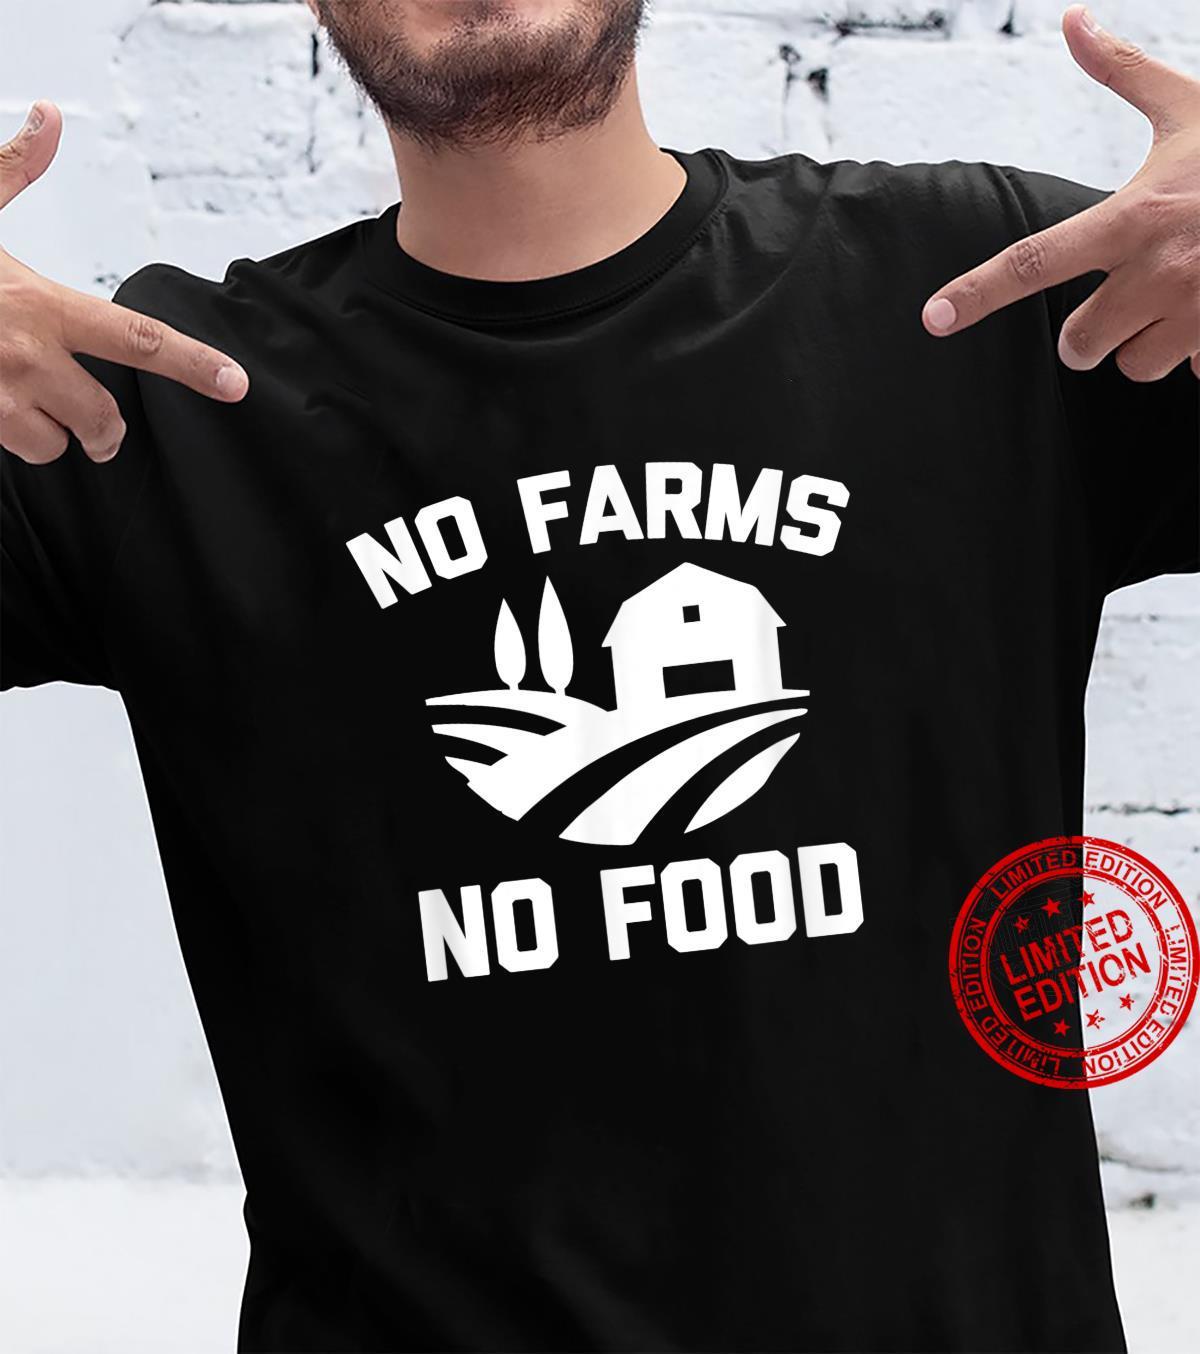 No Farms, No Food farmer activist farm farming Shirt